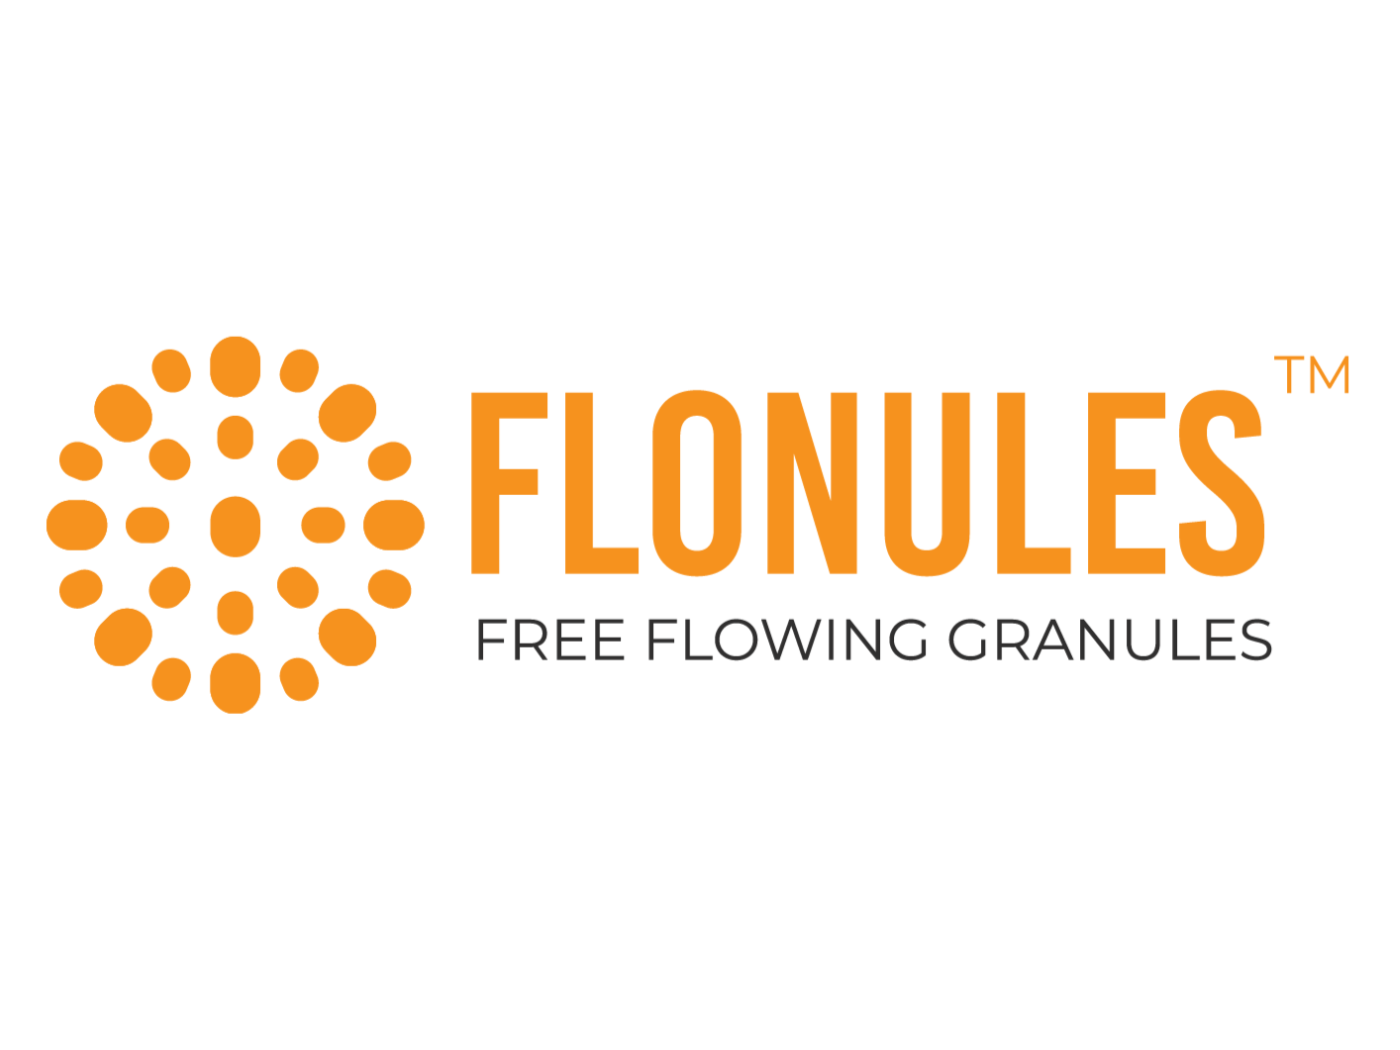 Flonules™ Fenugreek Dry Extract Granules 50%